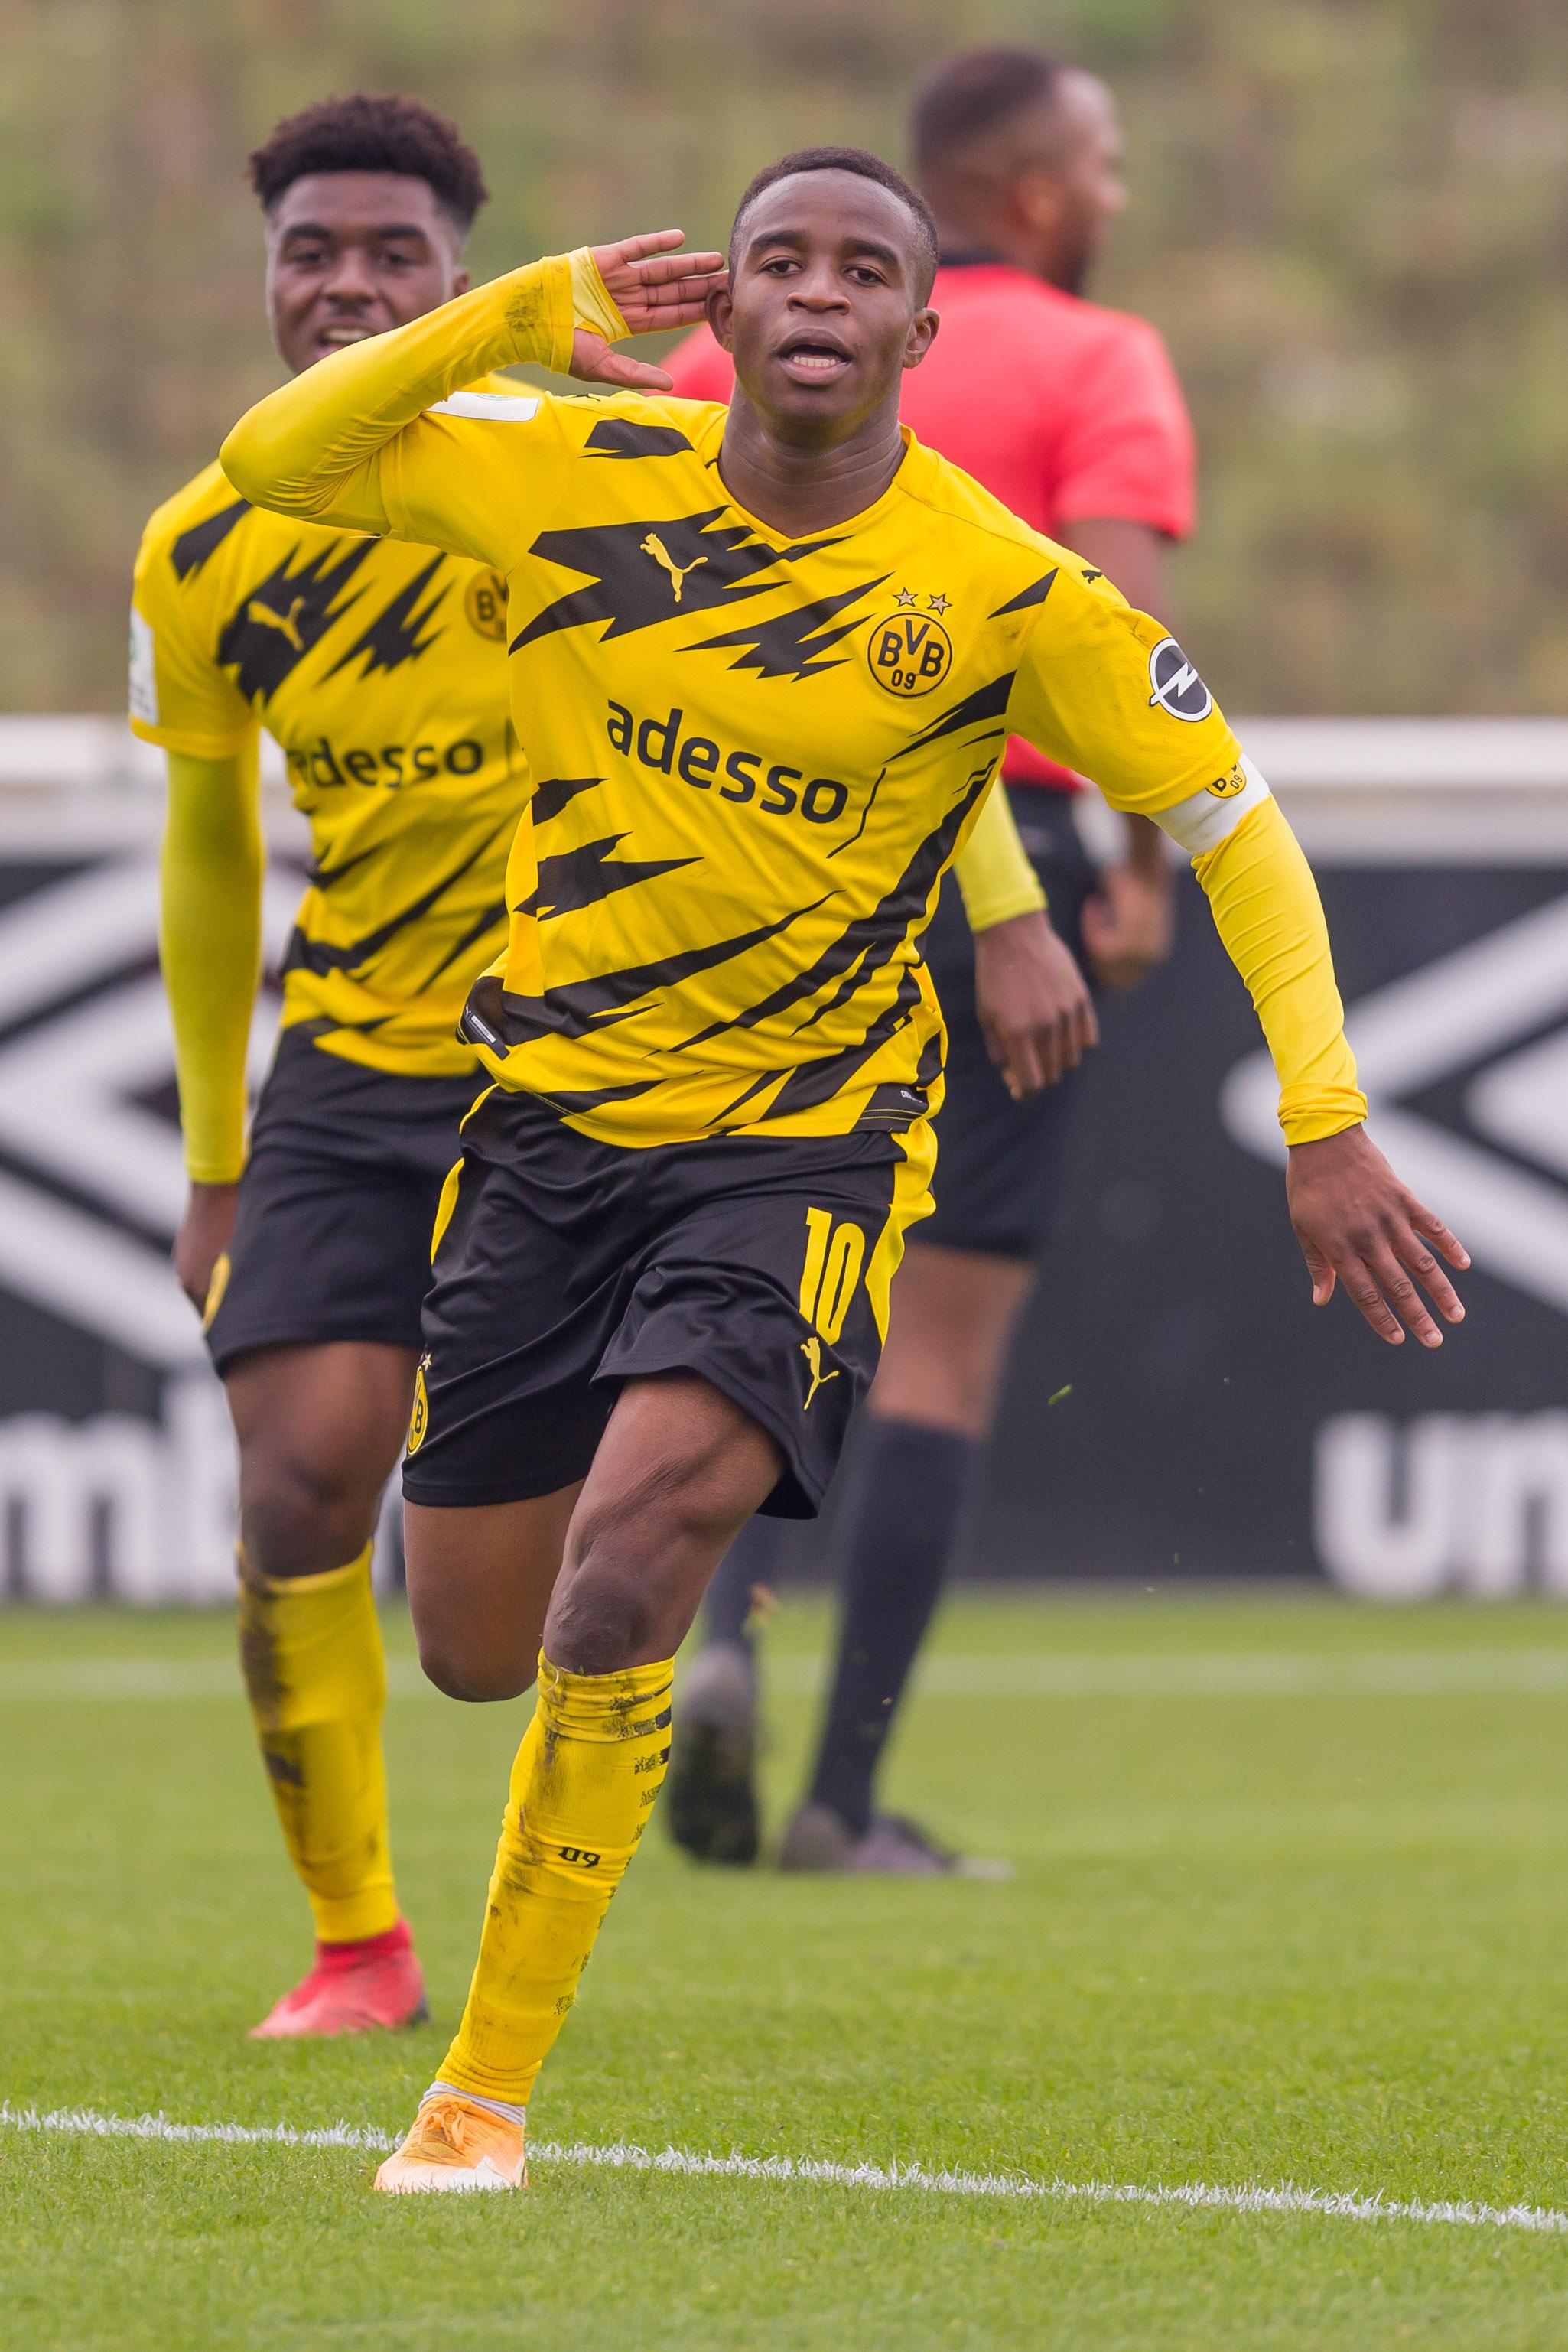 Youssoufa Moukoko, 15, targeted by vile racists after scoring hat-trick for Borussia Dortmund U19s in derby vs Schalke